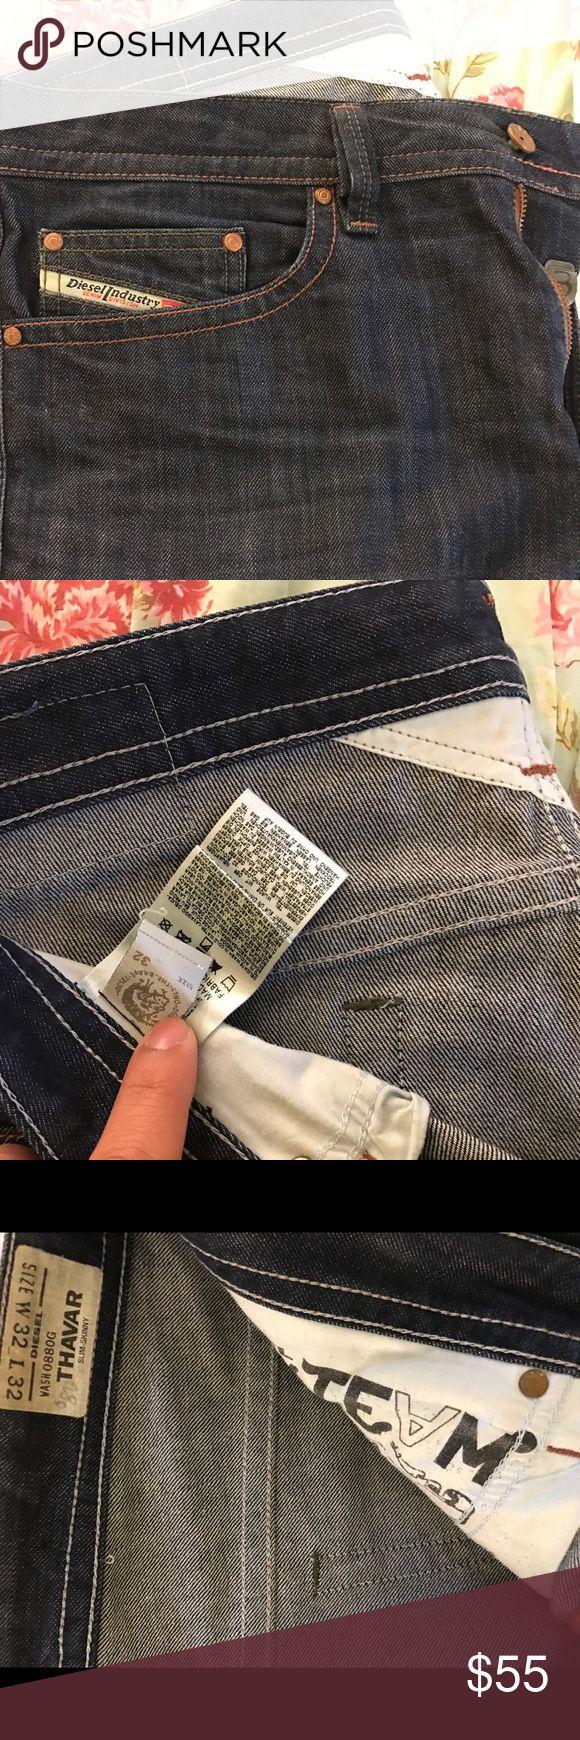 ❗️🚨Diesel 👖🔈SALE 🚨❗️ Great opportunity !!!! Pants